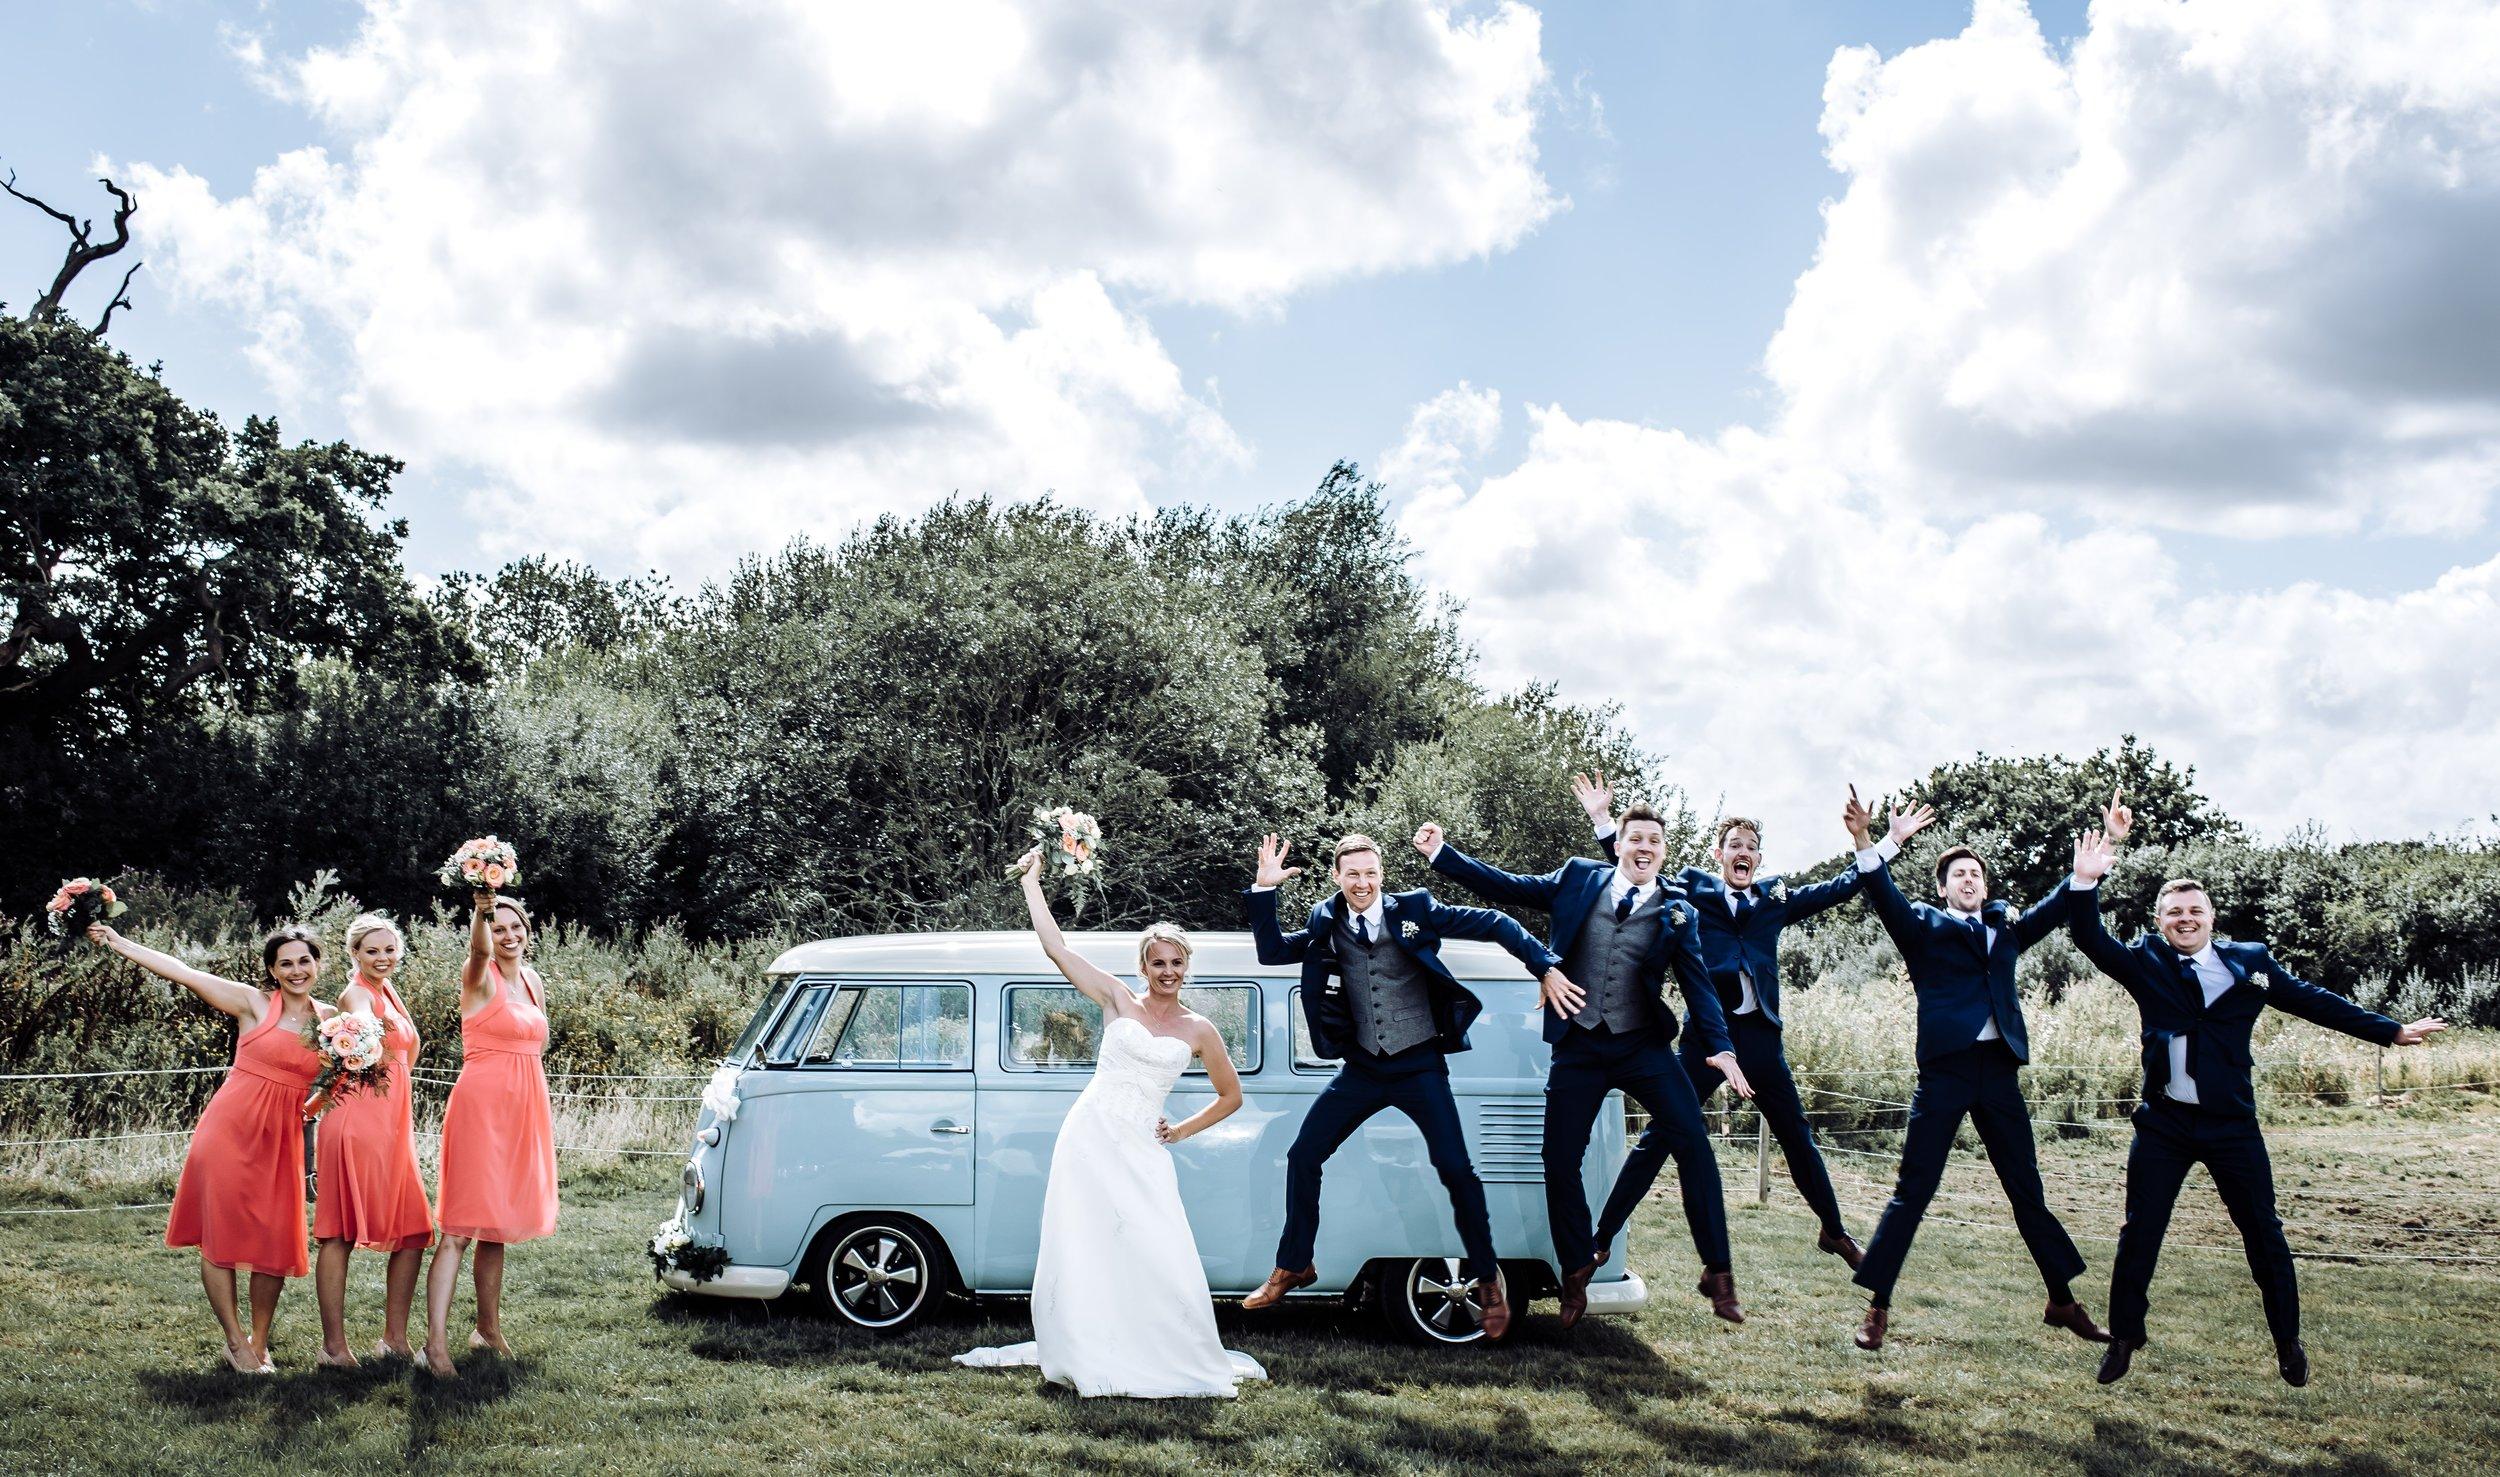 Vintage Wedding - East Sussex Wedding Photographer_0107.jpg